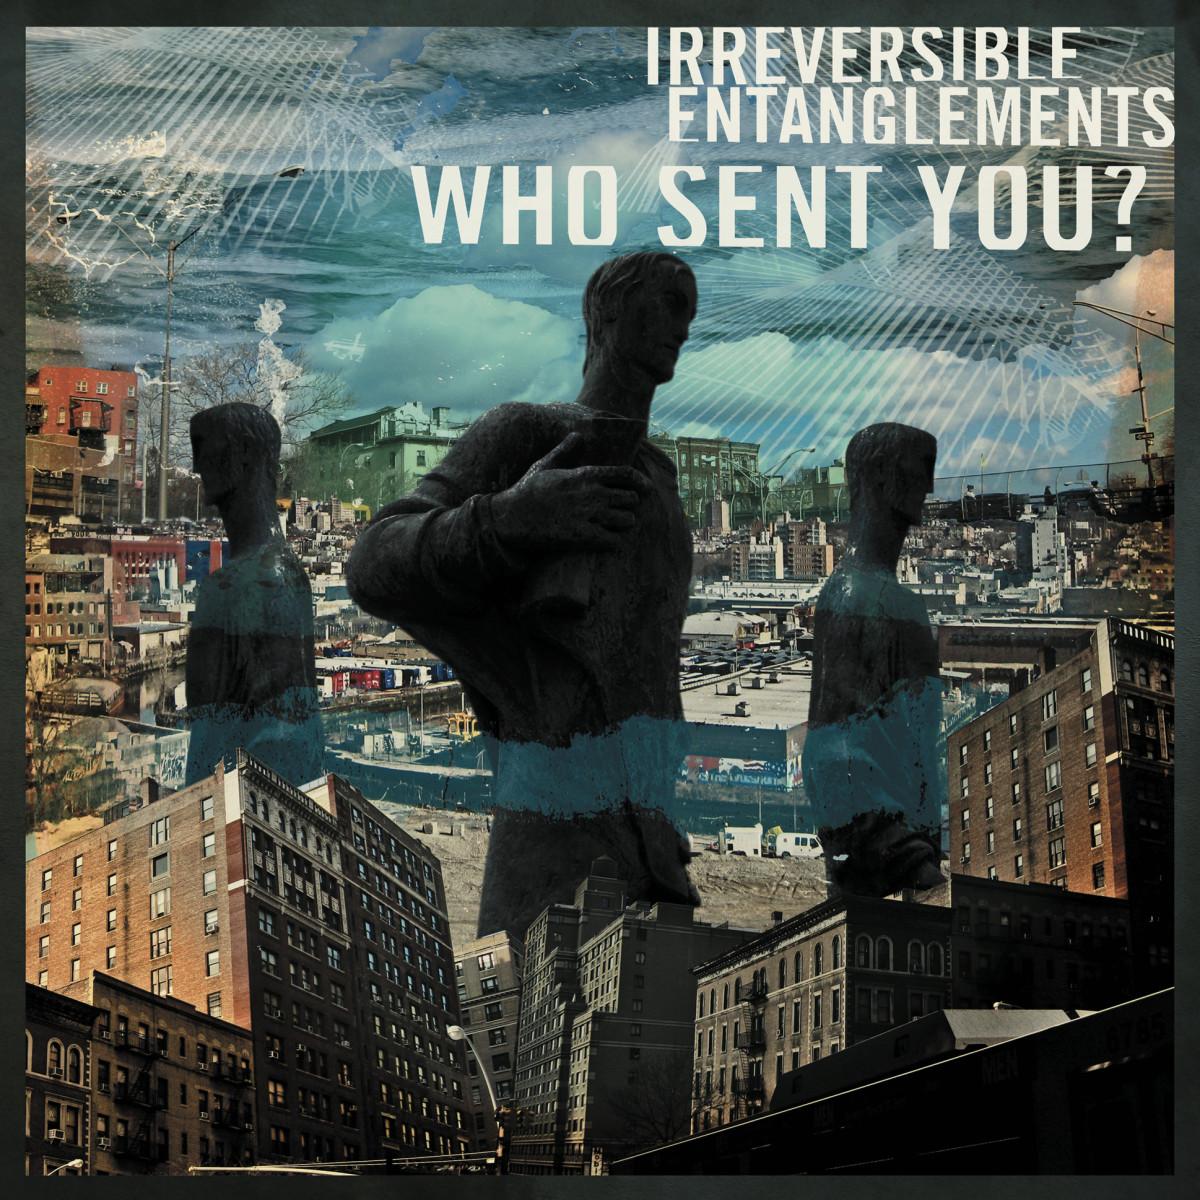 Irreversible Entanglements new album Who Sent You